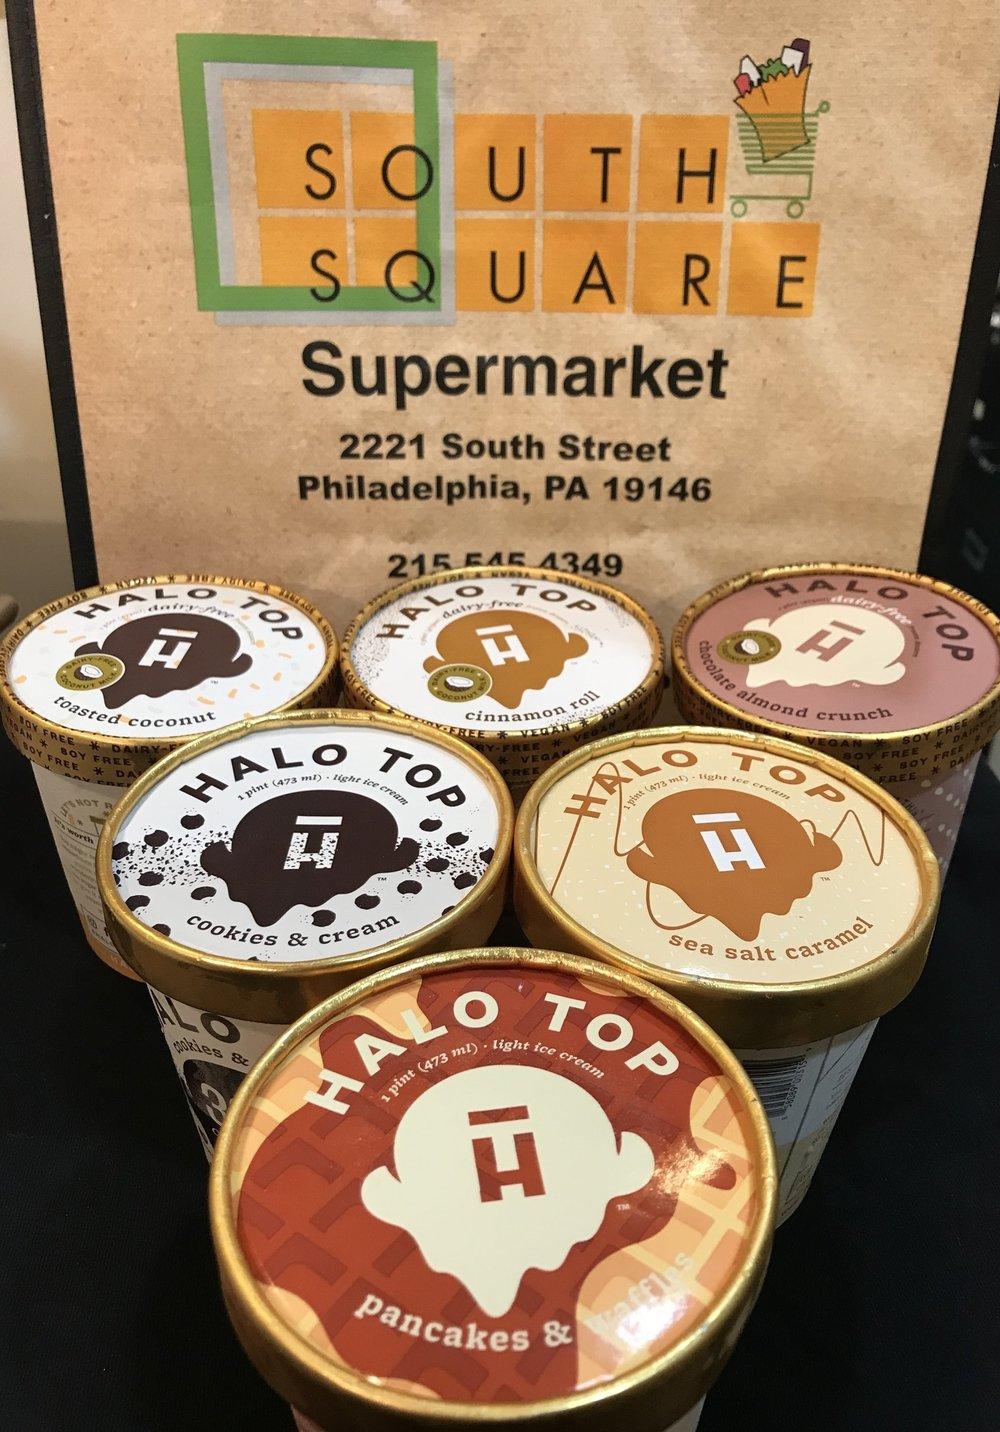 Halo Top Ice Cream (Dairy Free too!)